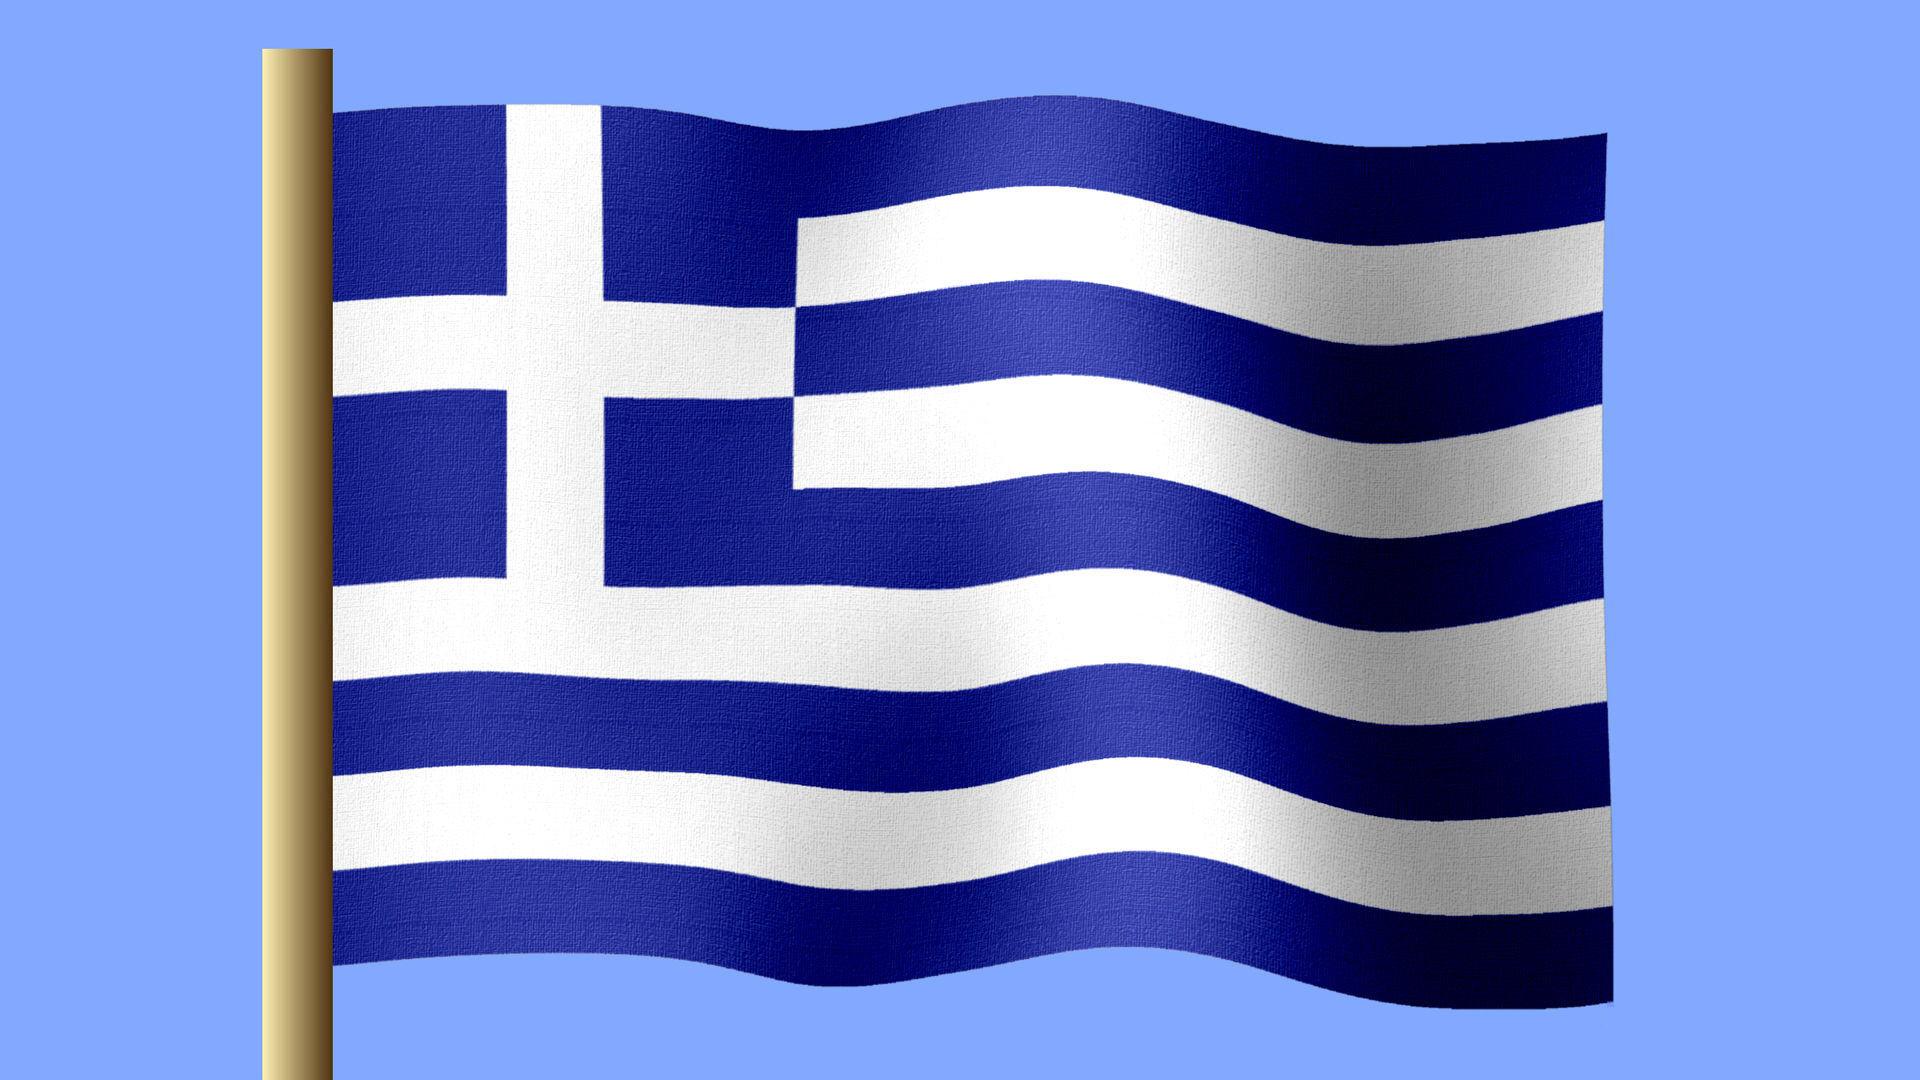 Greek wallpapers photos and desktop backgrounds up to 8k 7680x4320 resolution - Greek flag wallpaper ...